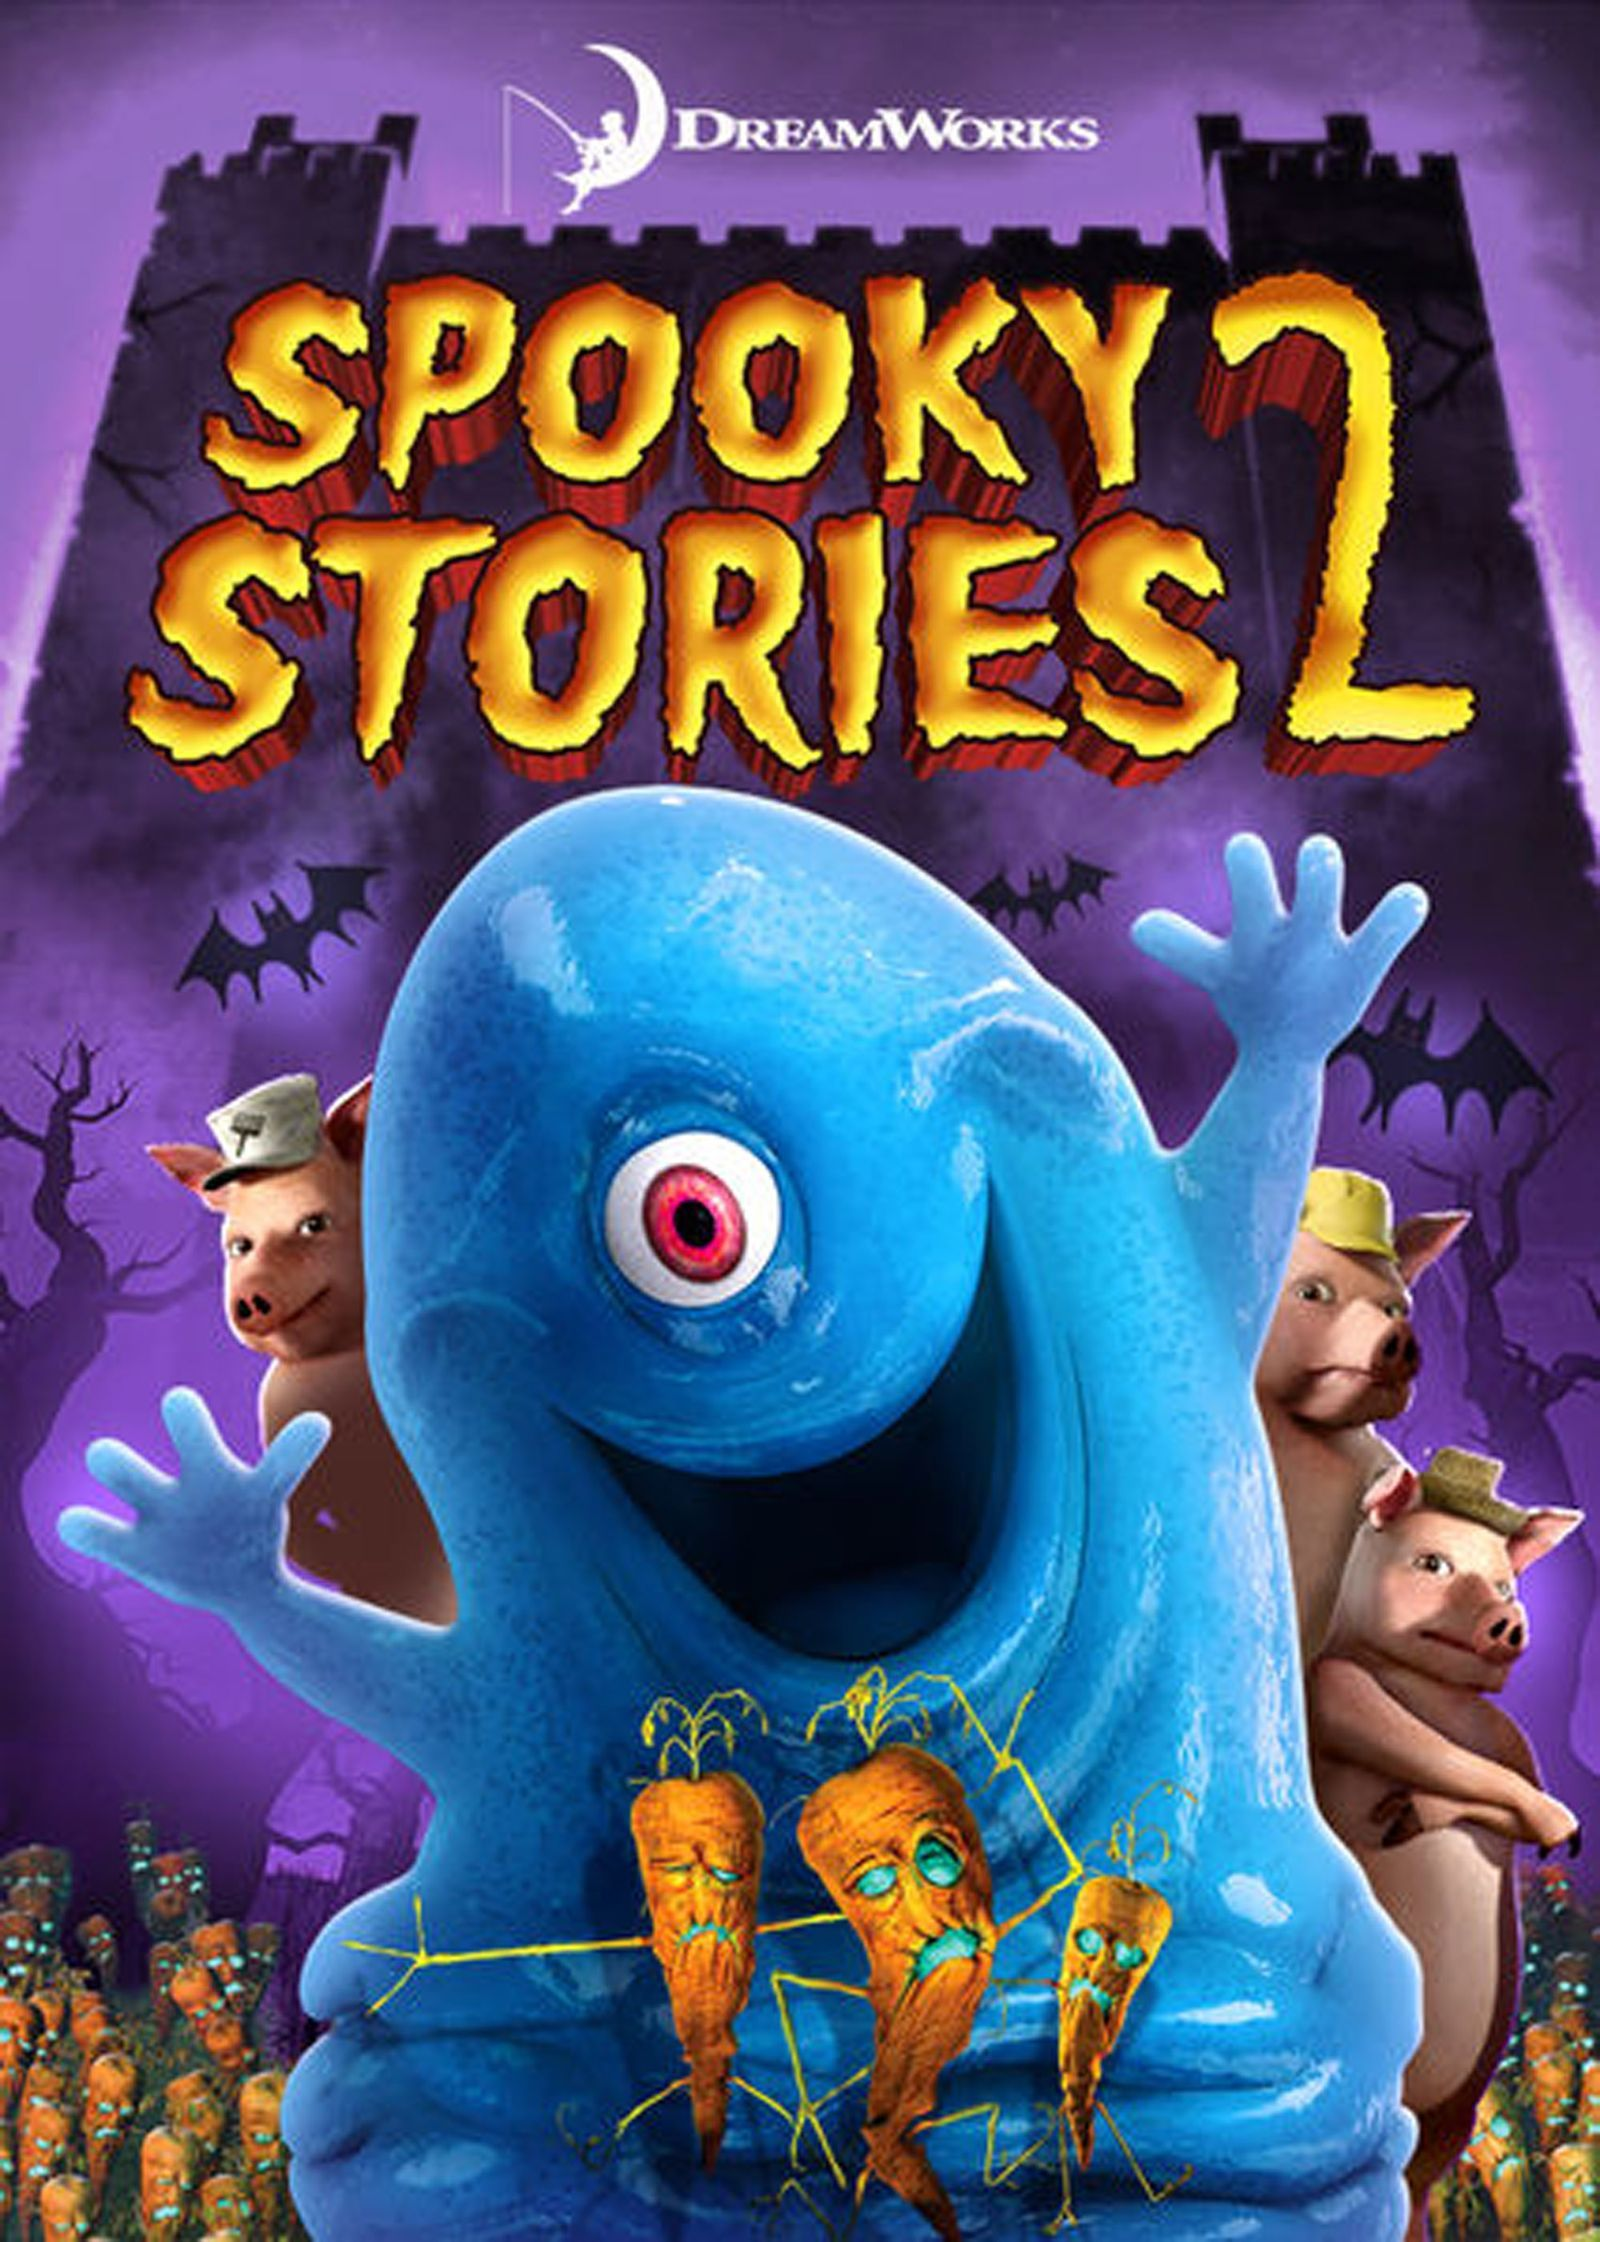 Halloween Movies On Netflix That Won T Give Kids The Creeps Peliculas Recomendadas Peliculas